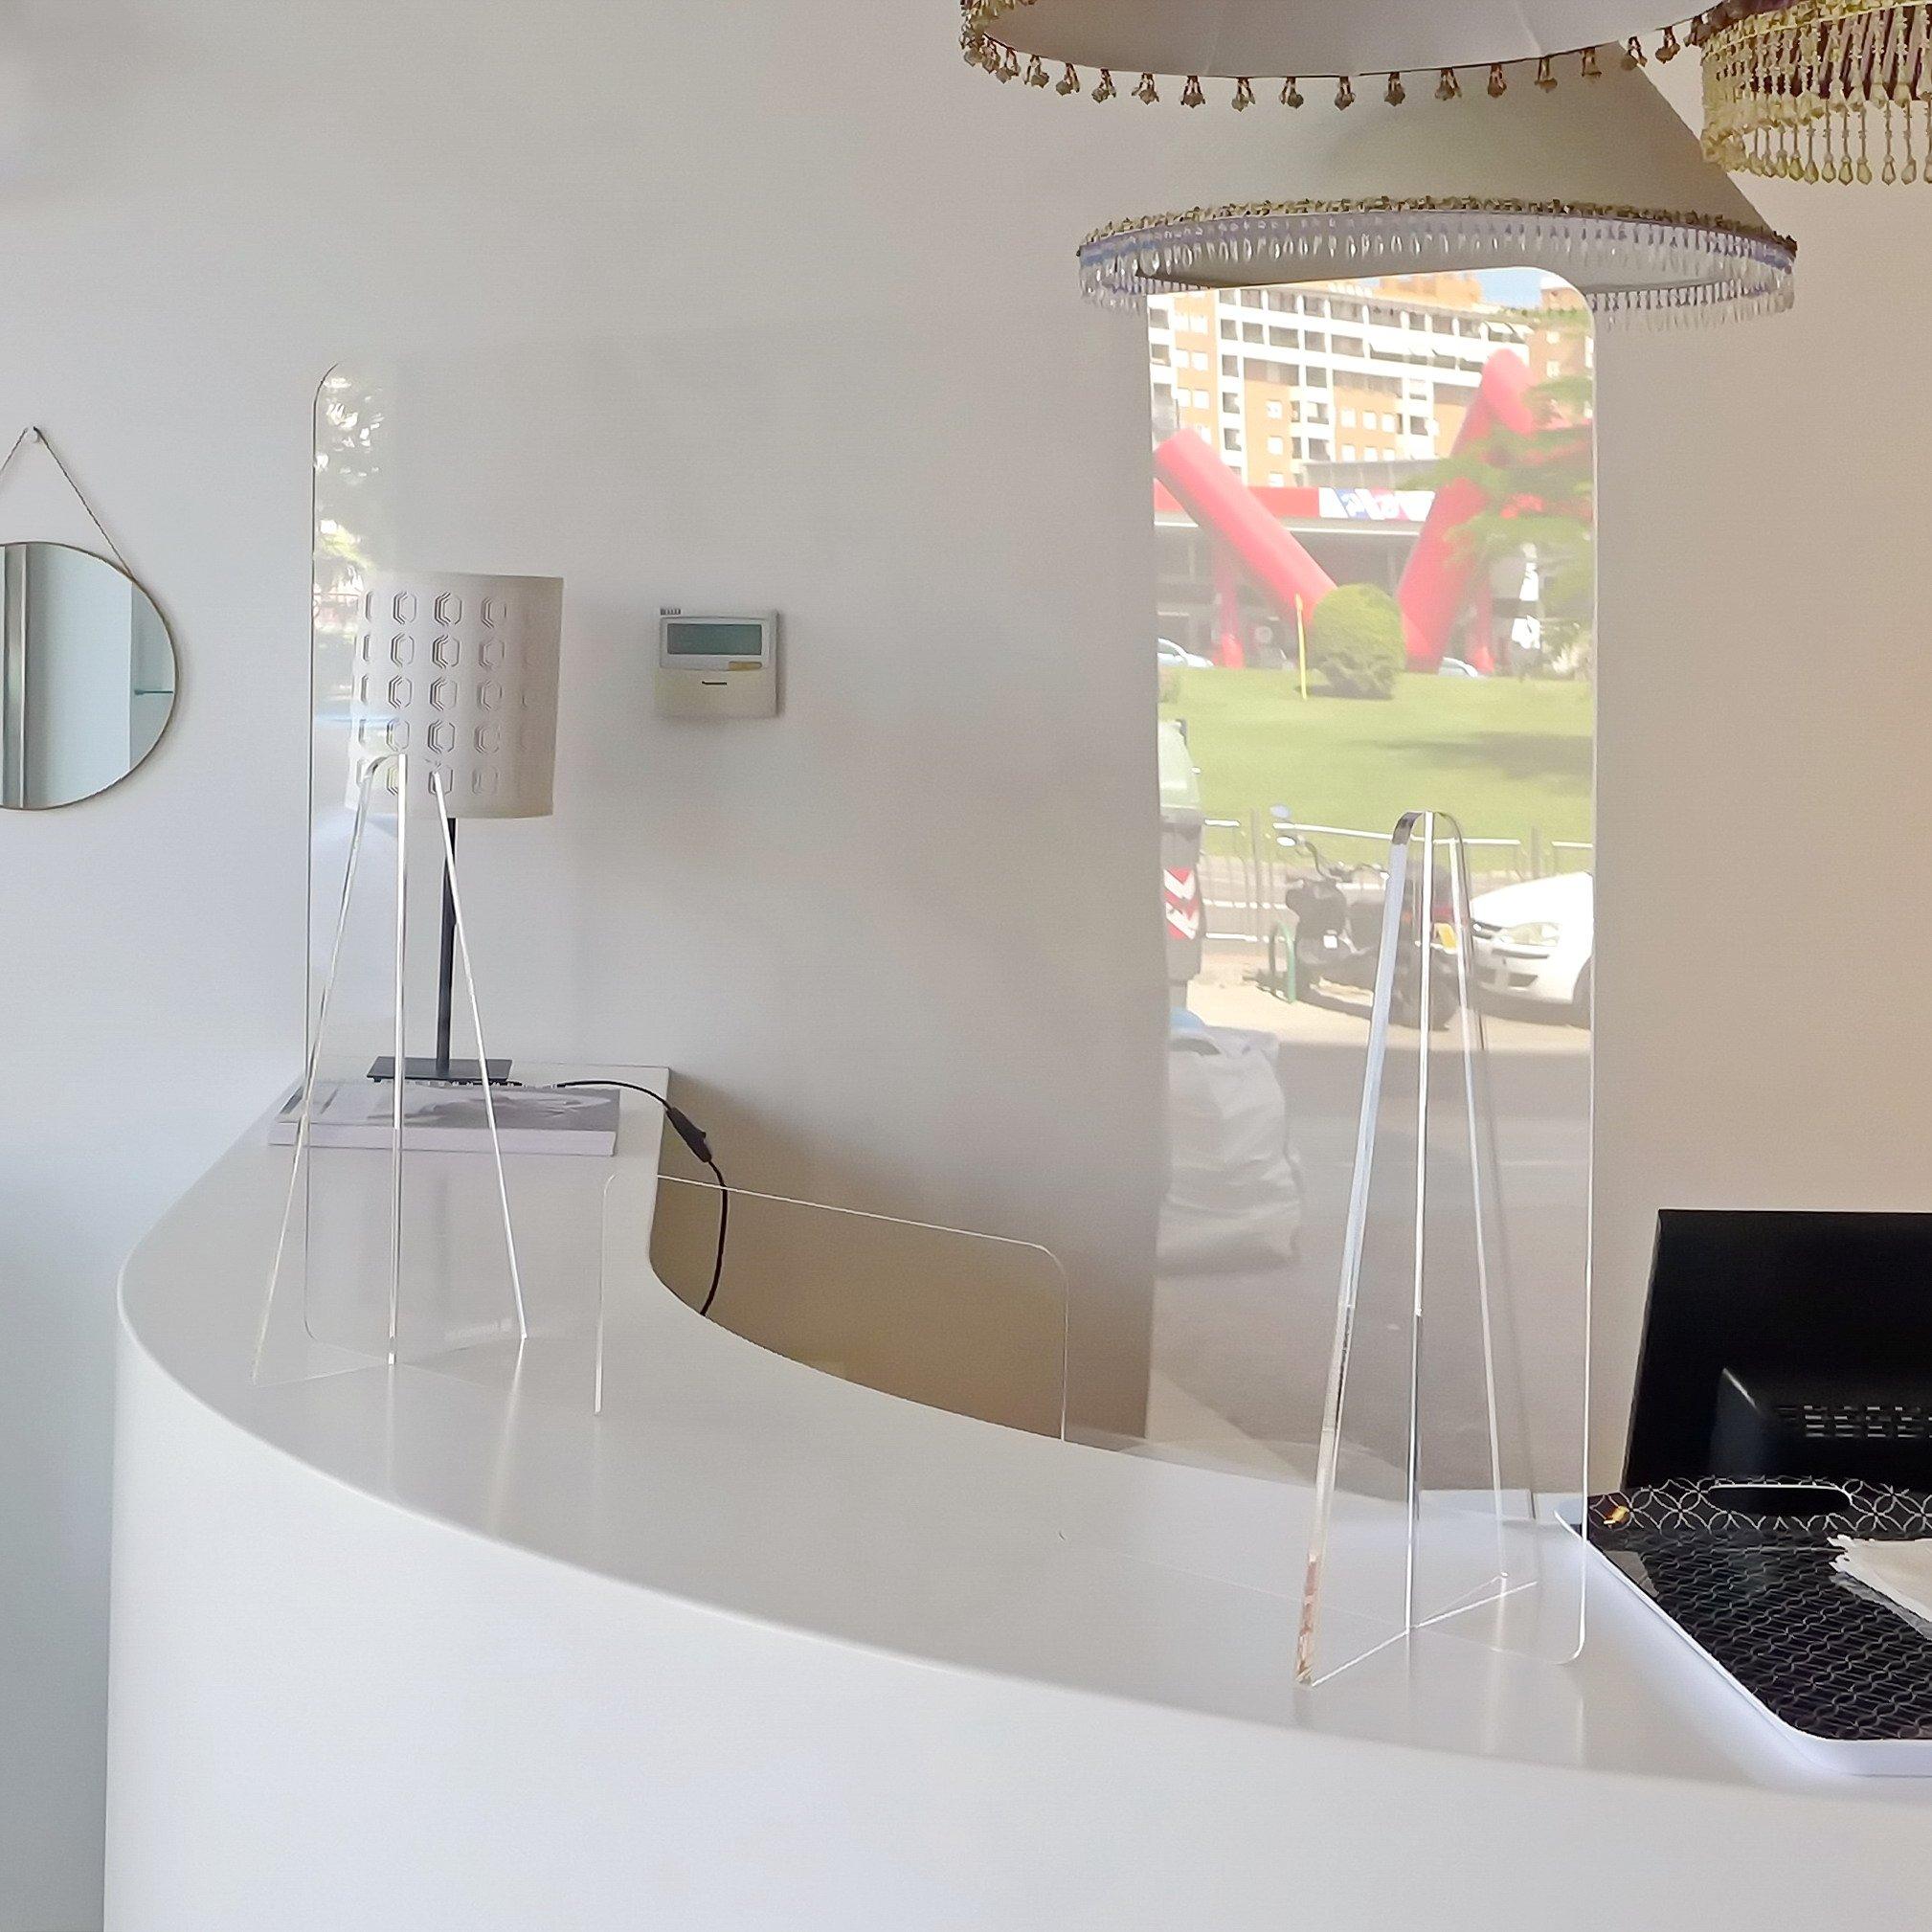 Mampara protectora Anticontagio para mostradores fabricada en Zaragoza